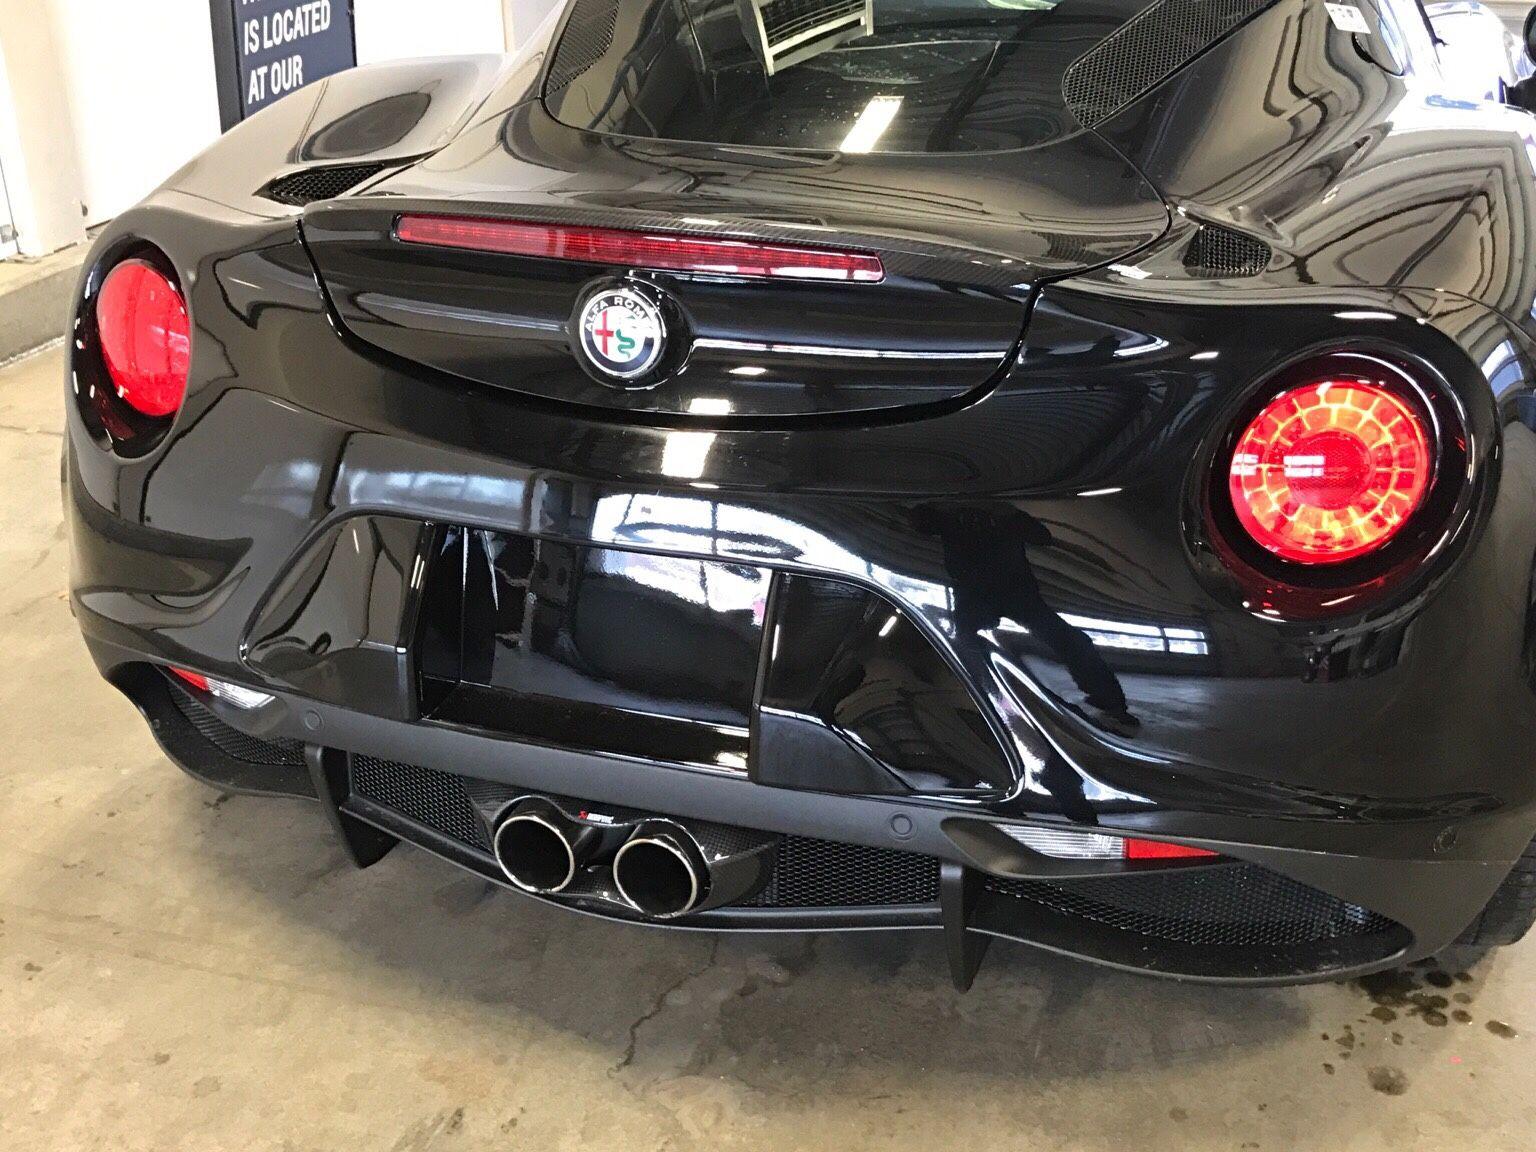 Akrapovic Cf Exhaust Tip Shroud With Centerline Stradale Corsa Alfa Romeo Transaxle 4c Forums